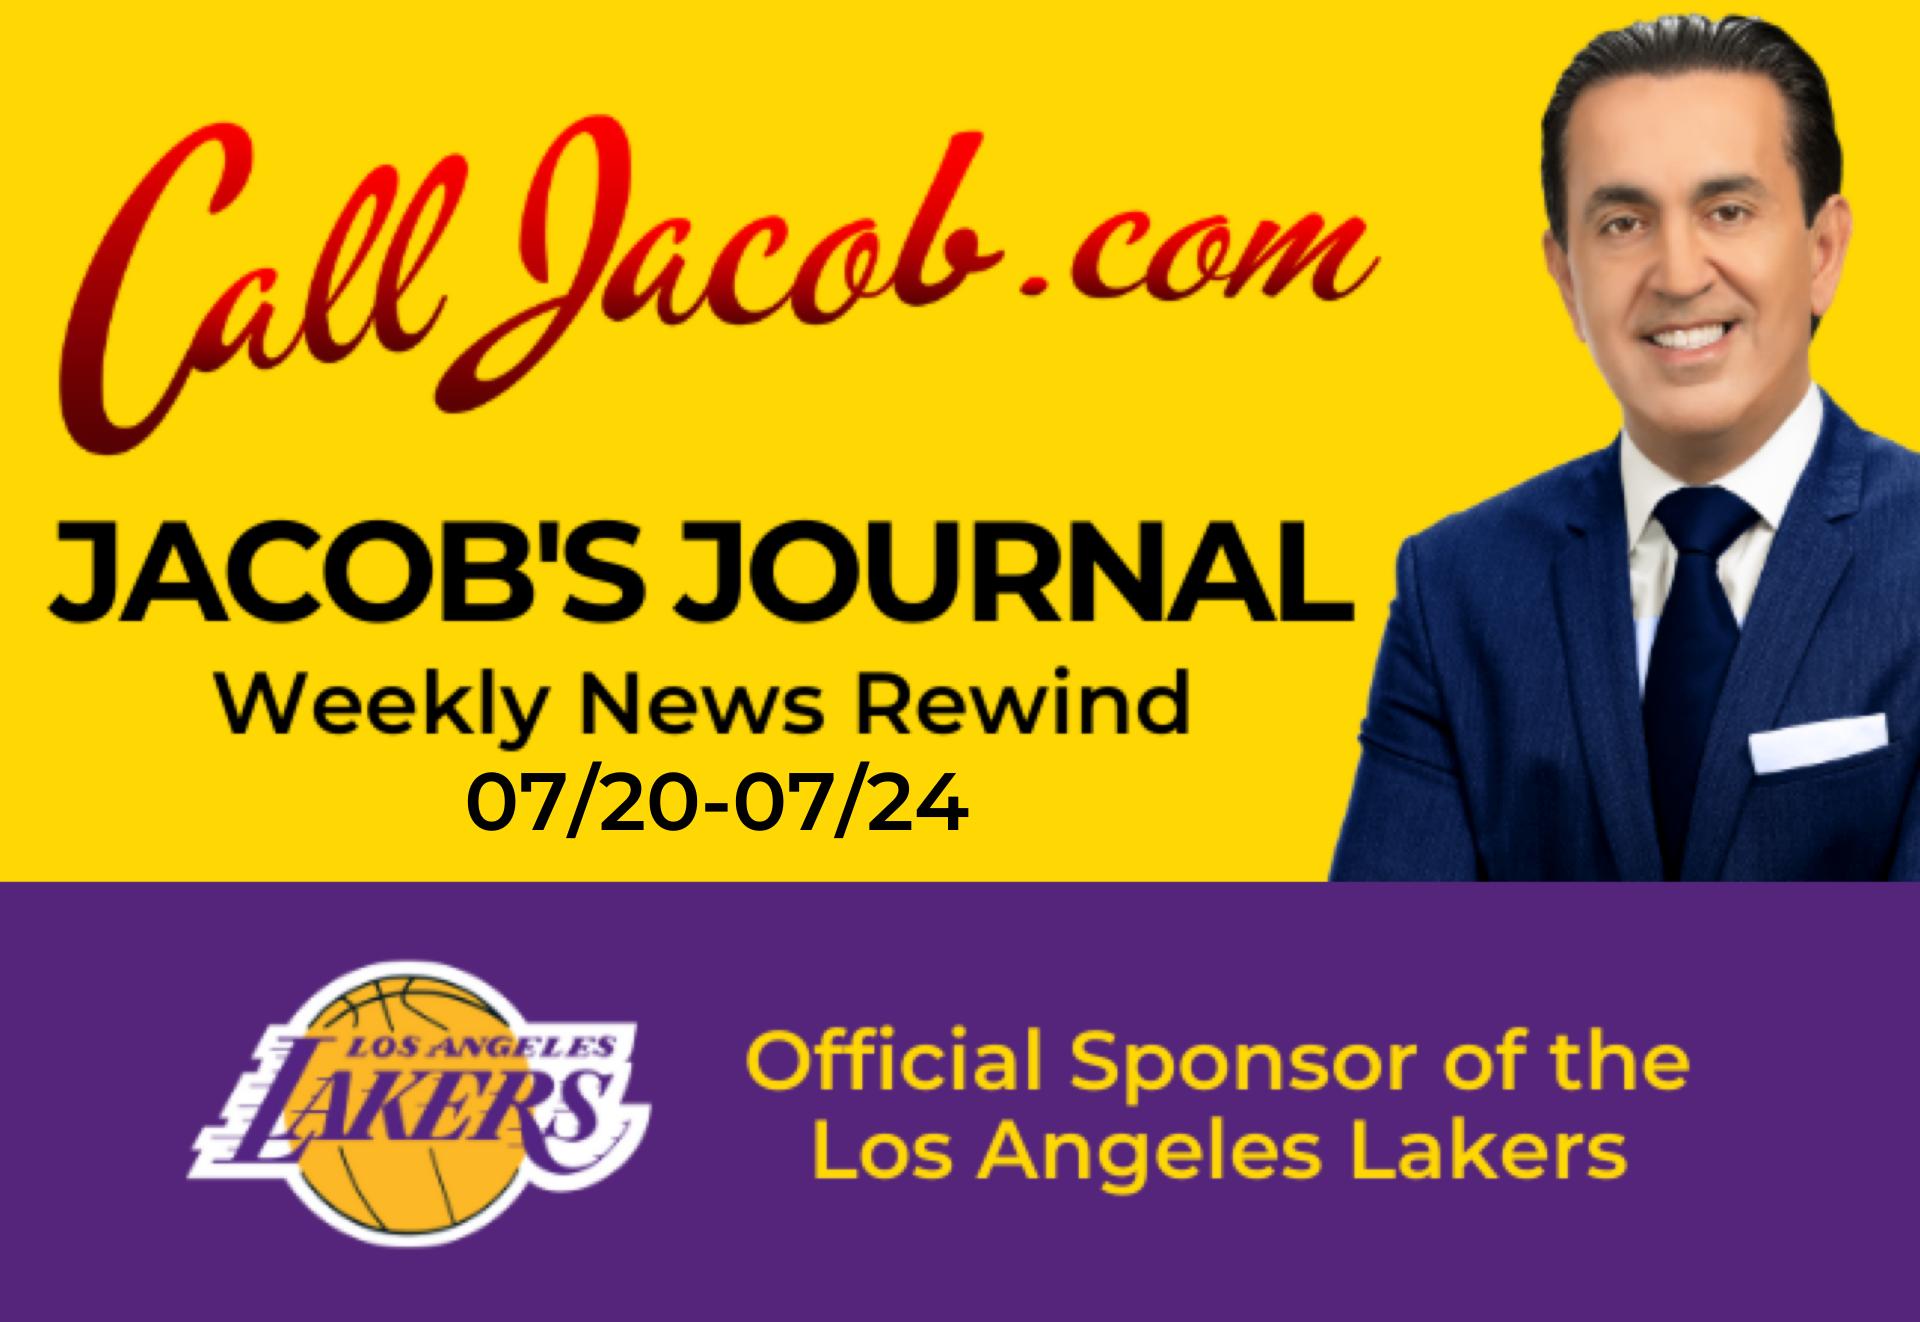 JacobsJournalWeeklyNewsRewind-7_20-07_24